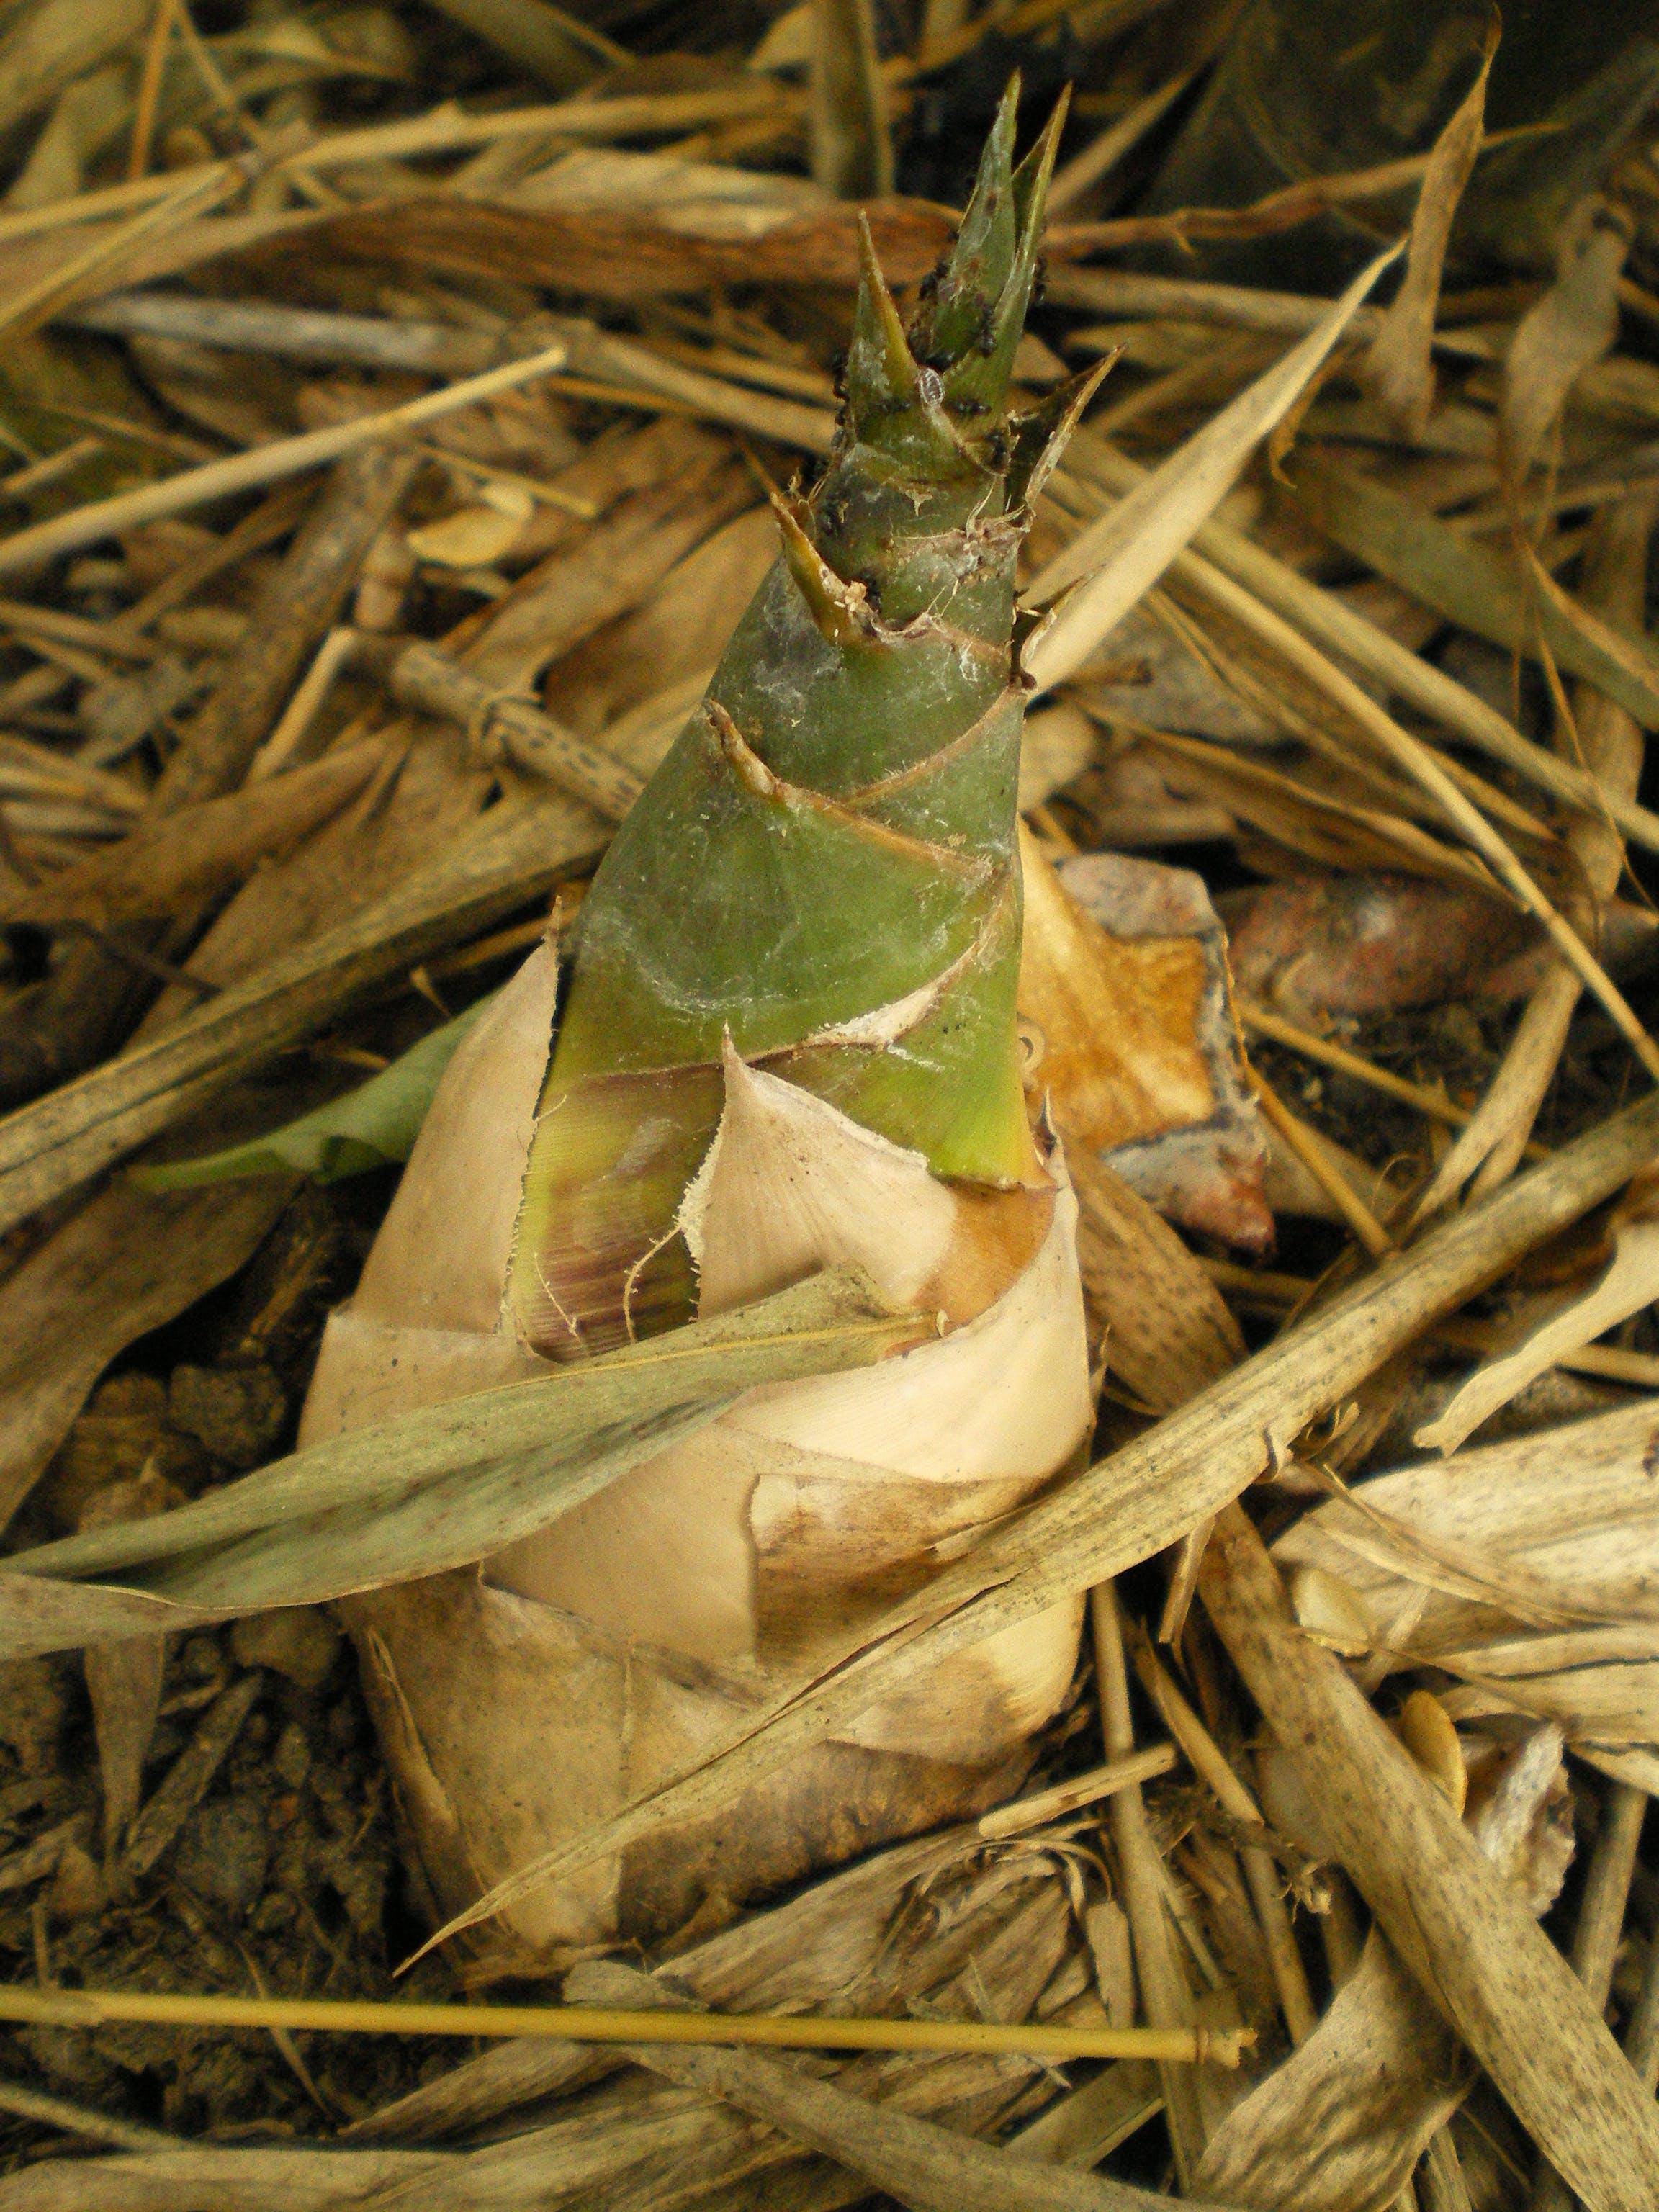 Free stock photo of bamboo, bamboo shoot, Bambuseae, brown